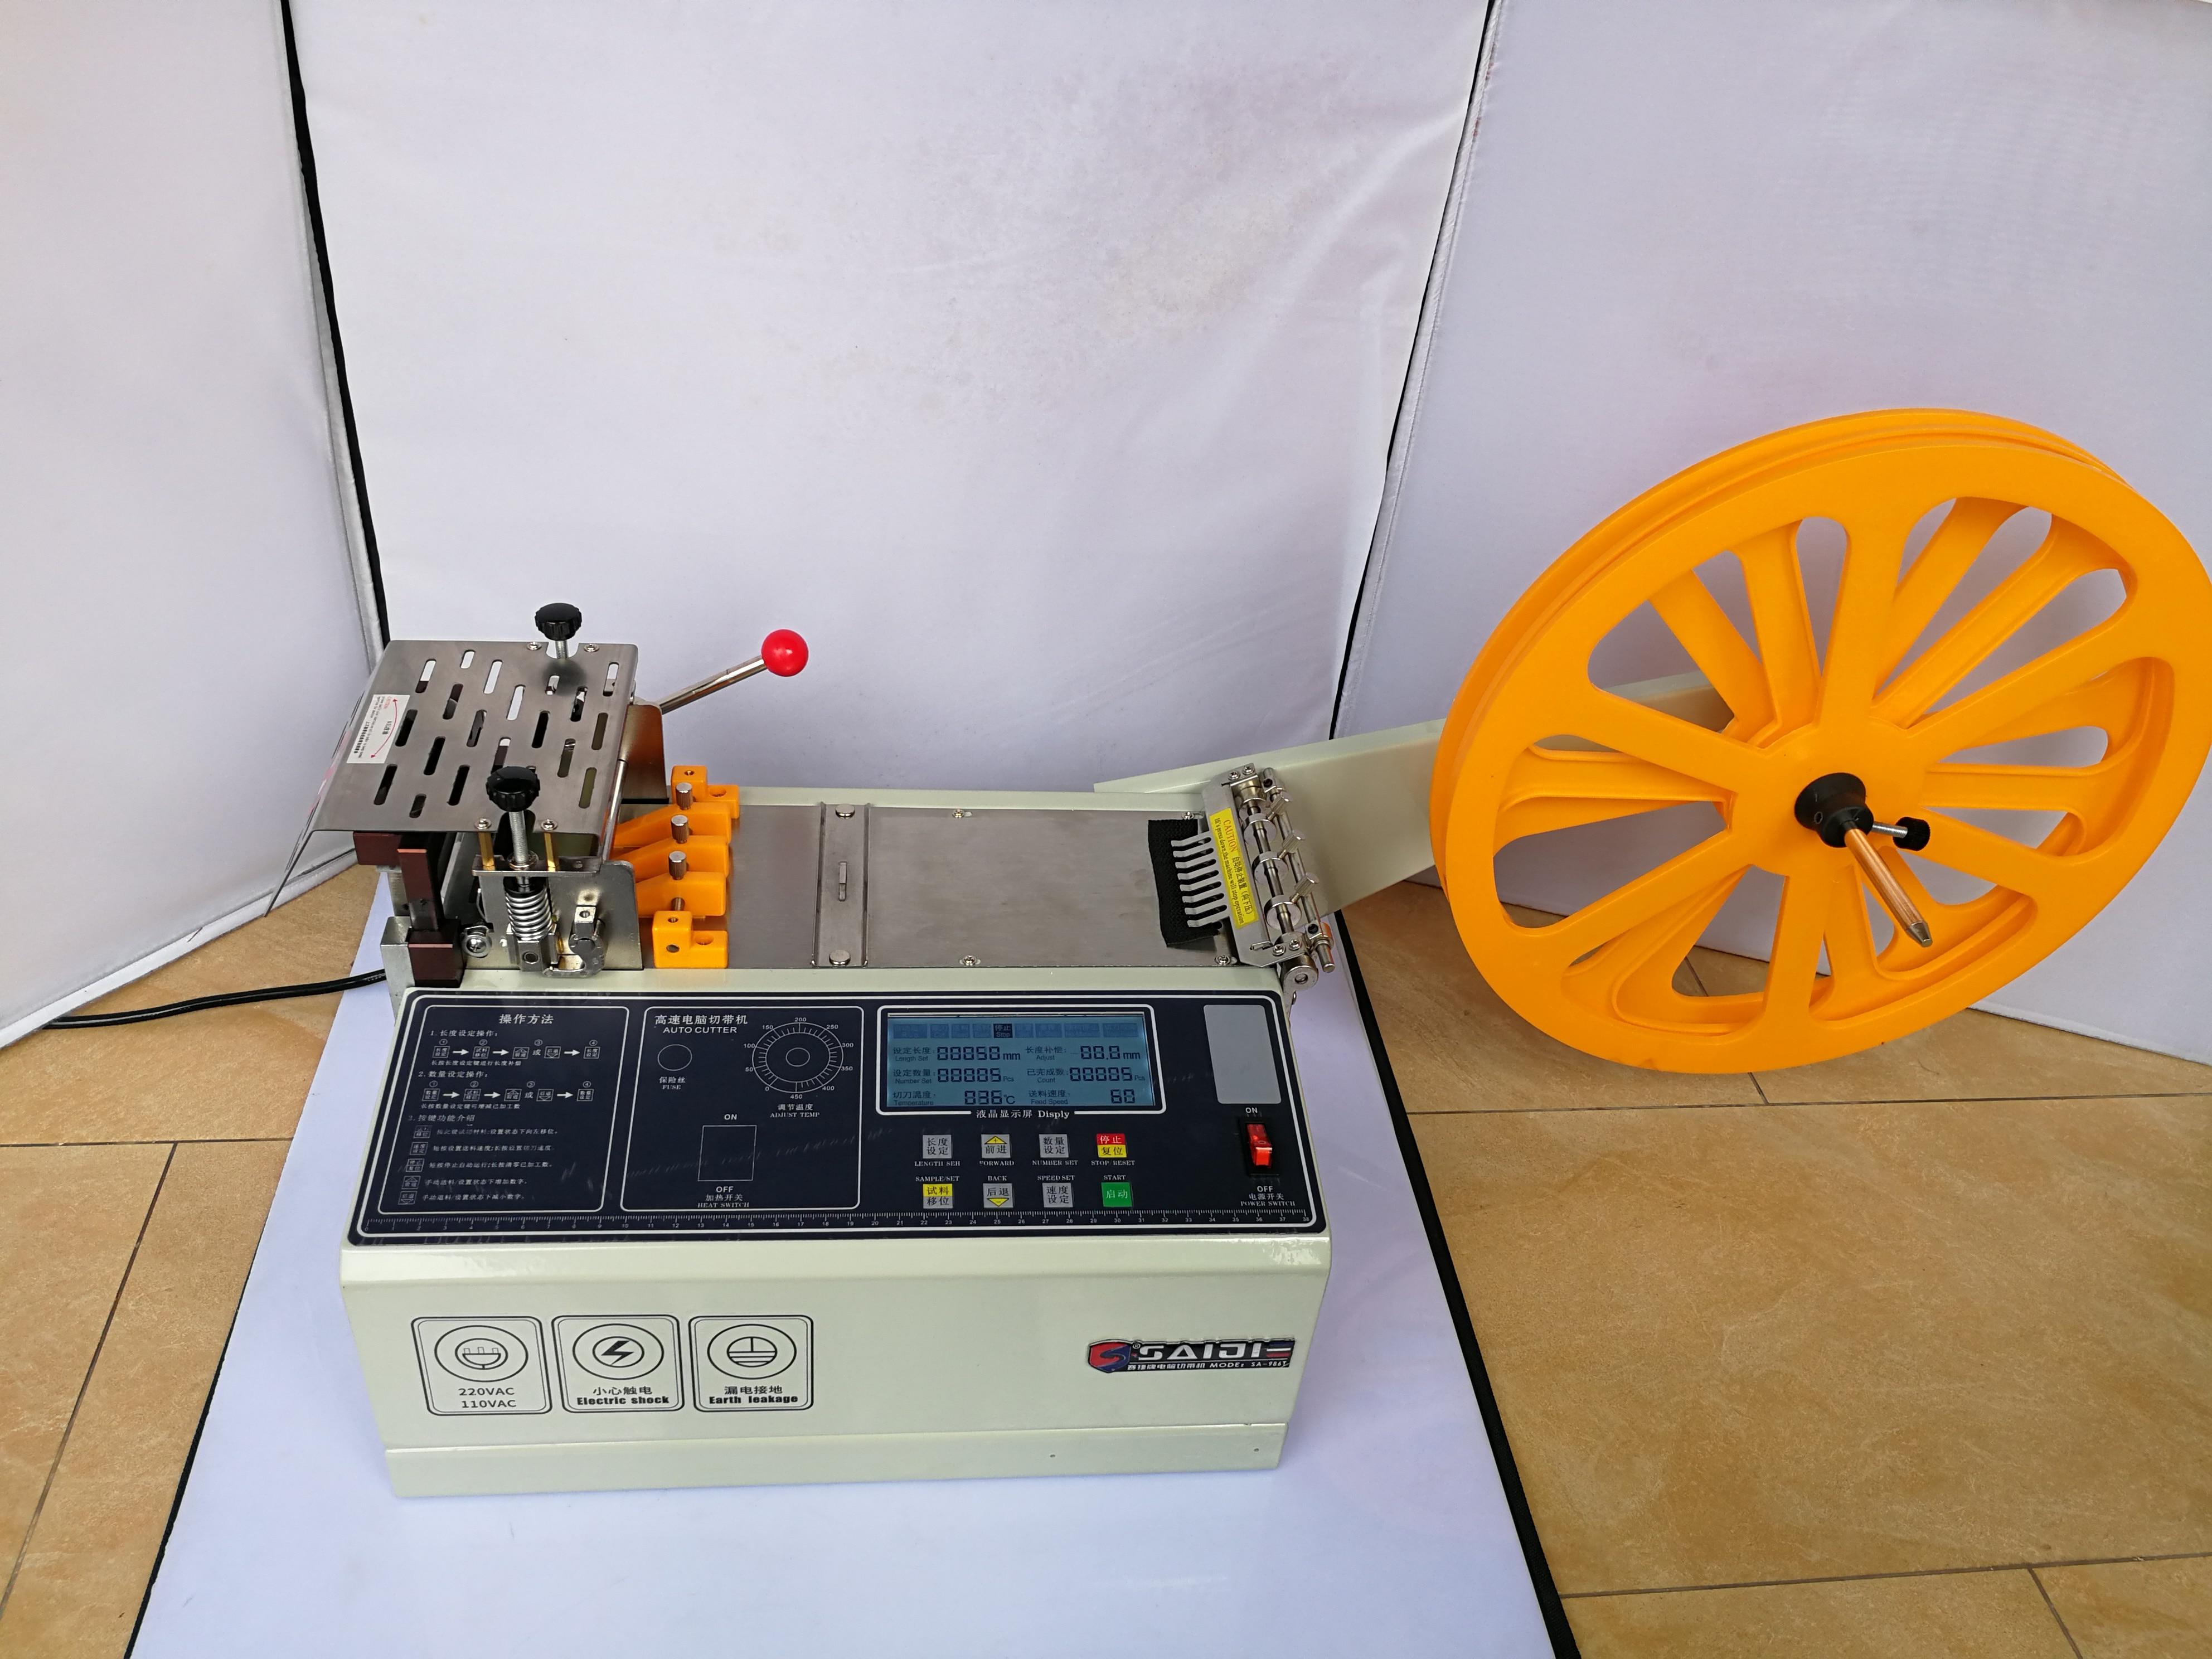 986T computer cold Cloth belt cutting machine magic adhesive tape zipper webbing machine elastic belt automatic